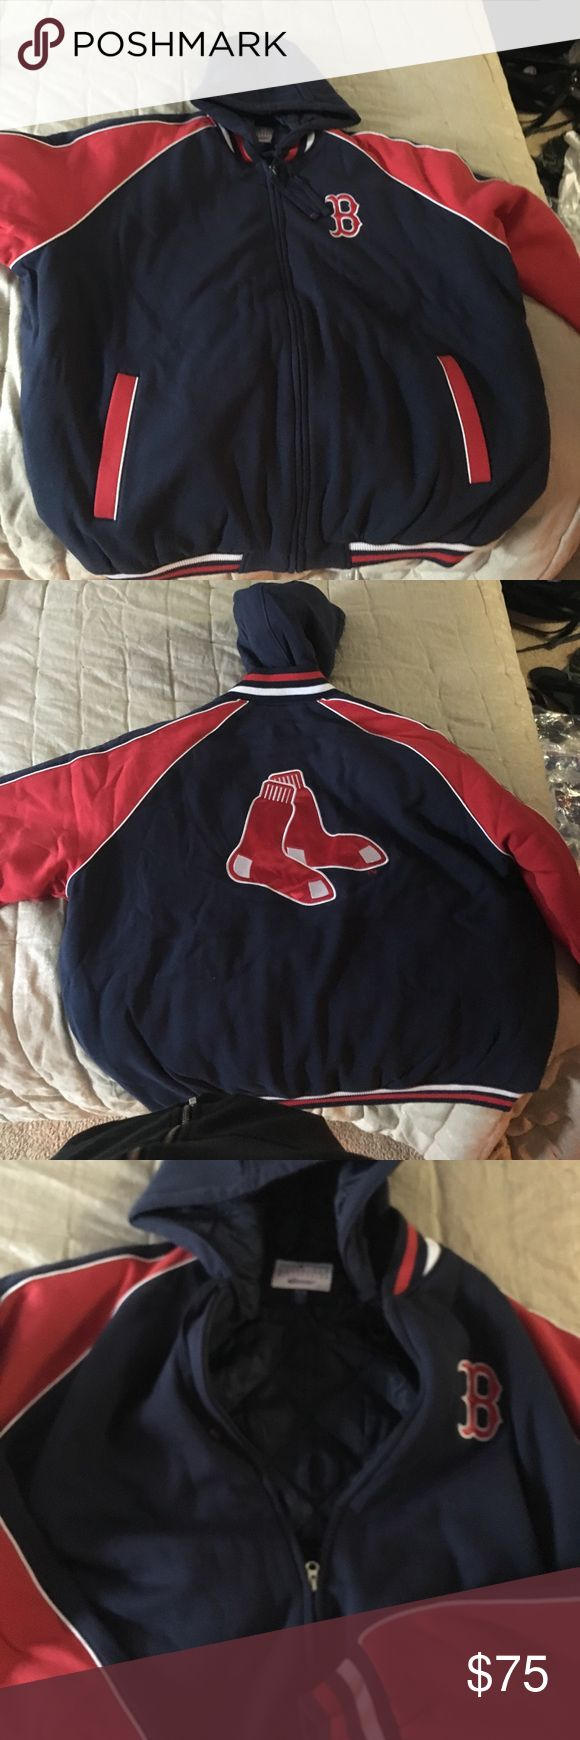 Red Sox jacket Authentic red sox jacket Jackets & Coats